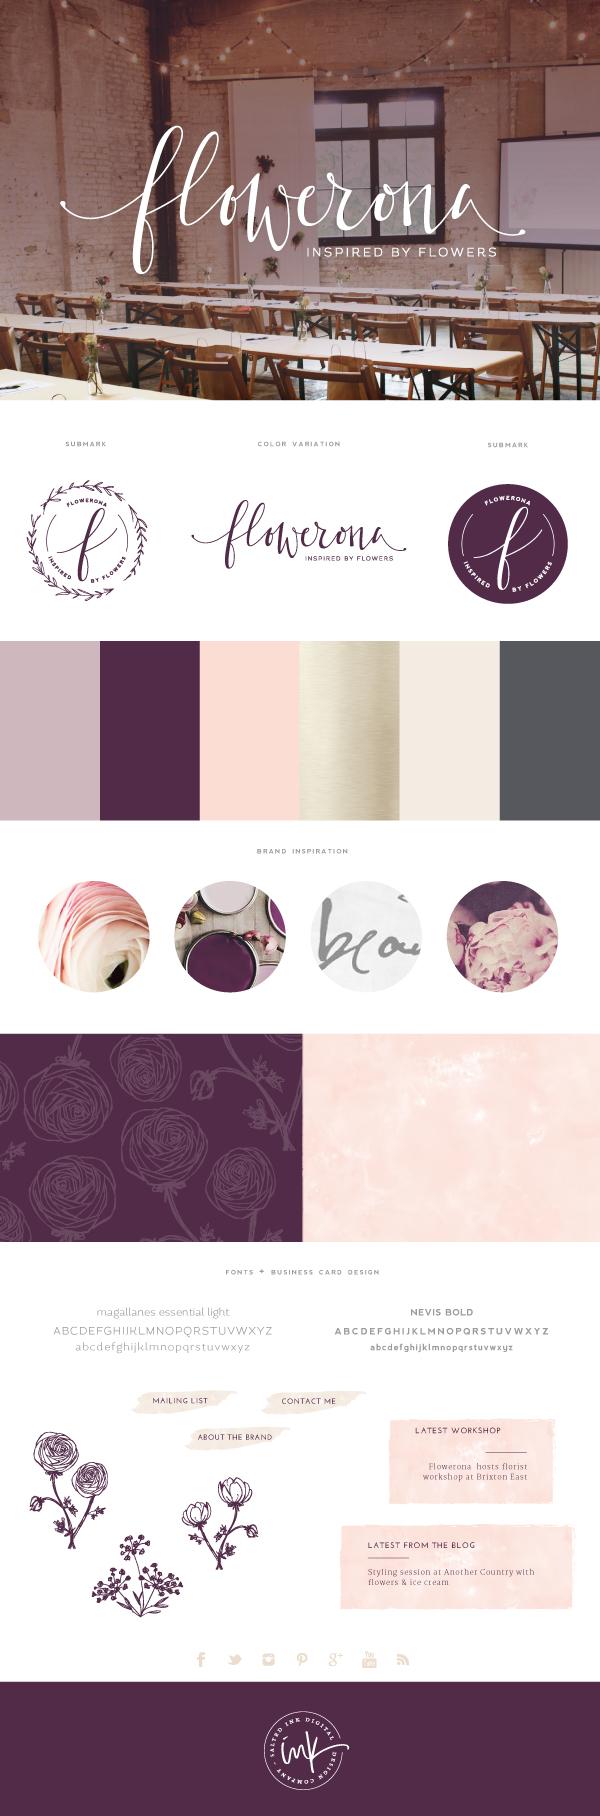 Flowerona Brand by Saltedink